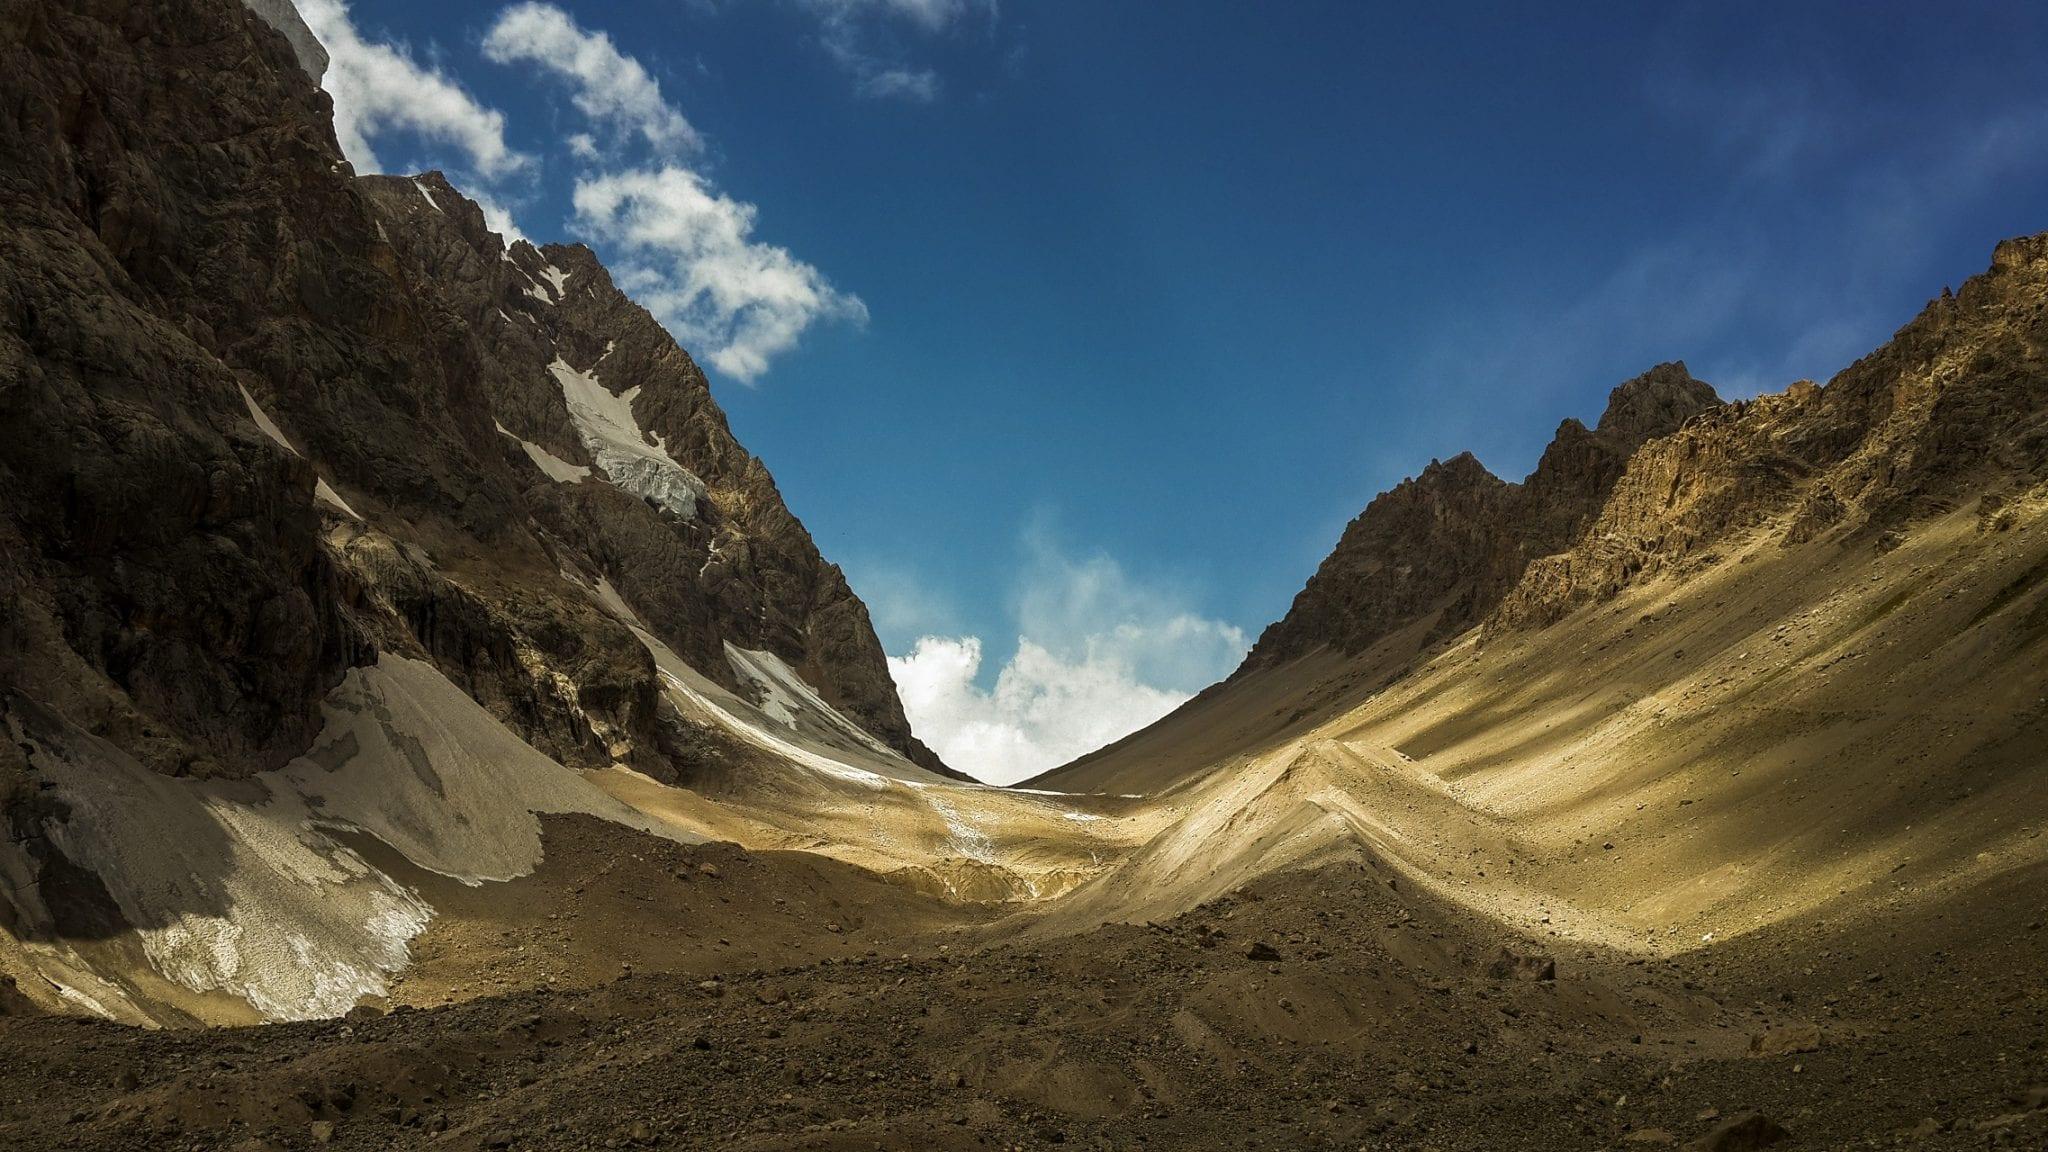 Off the beaten track - Fann mountains Tajikistan